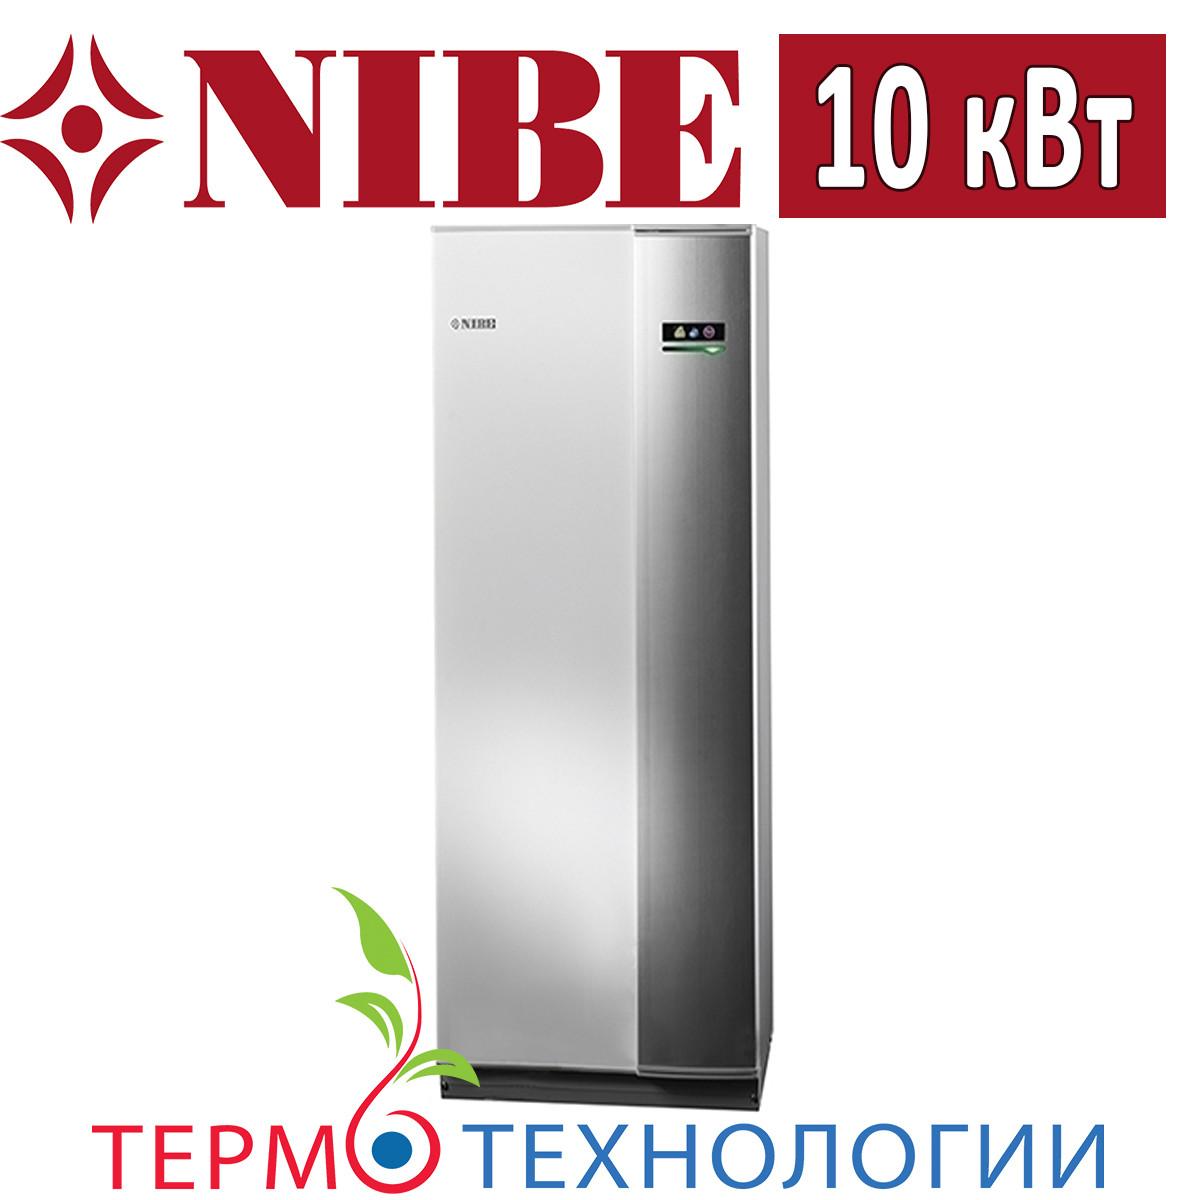 Тепловой насос грунт-вода Nibe F1245-10 R 10 кВт, 380 В